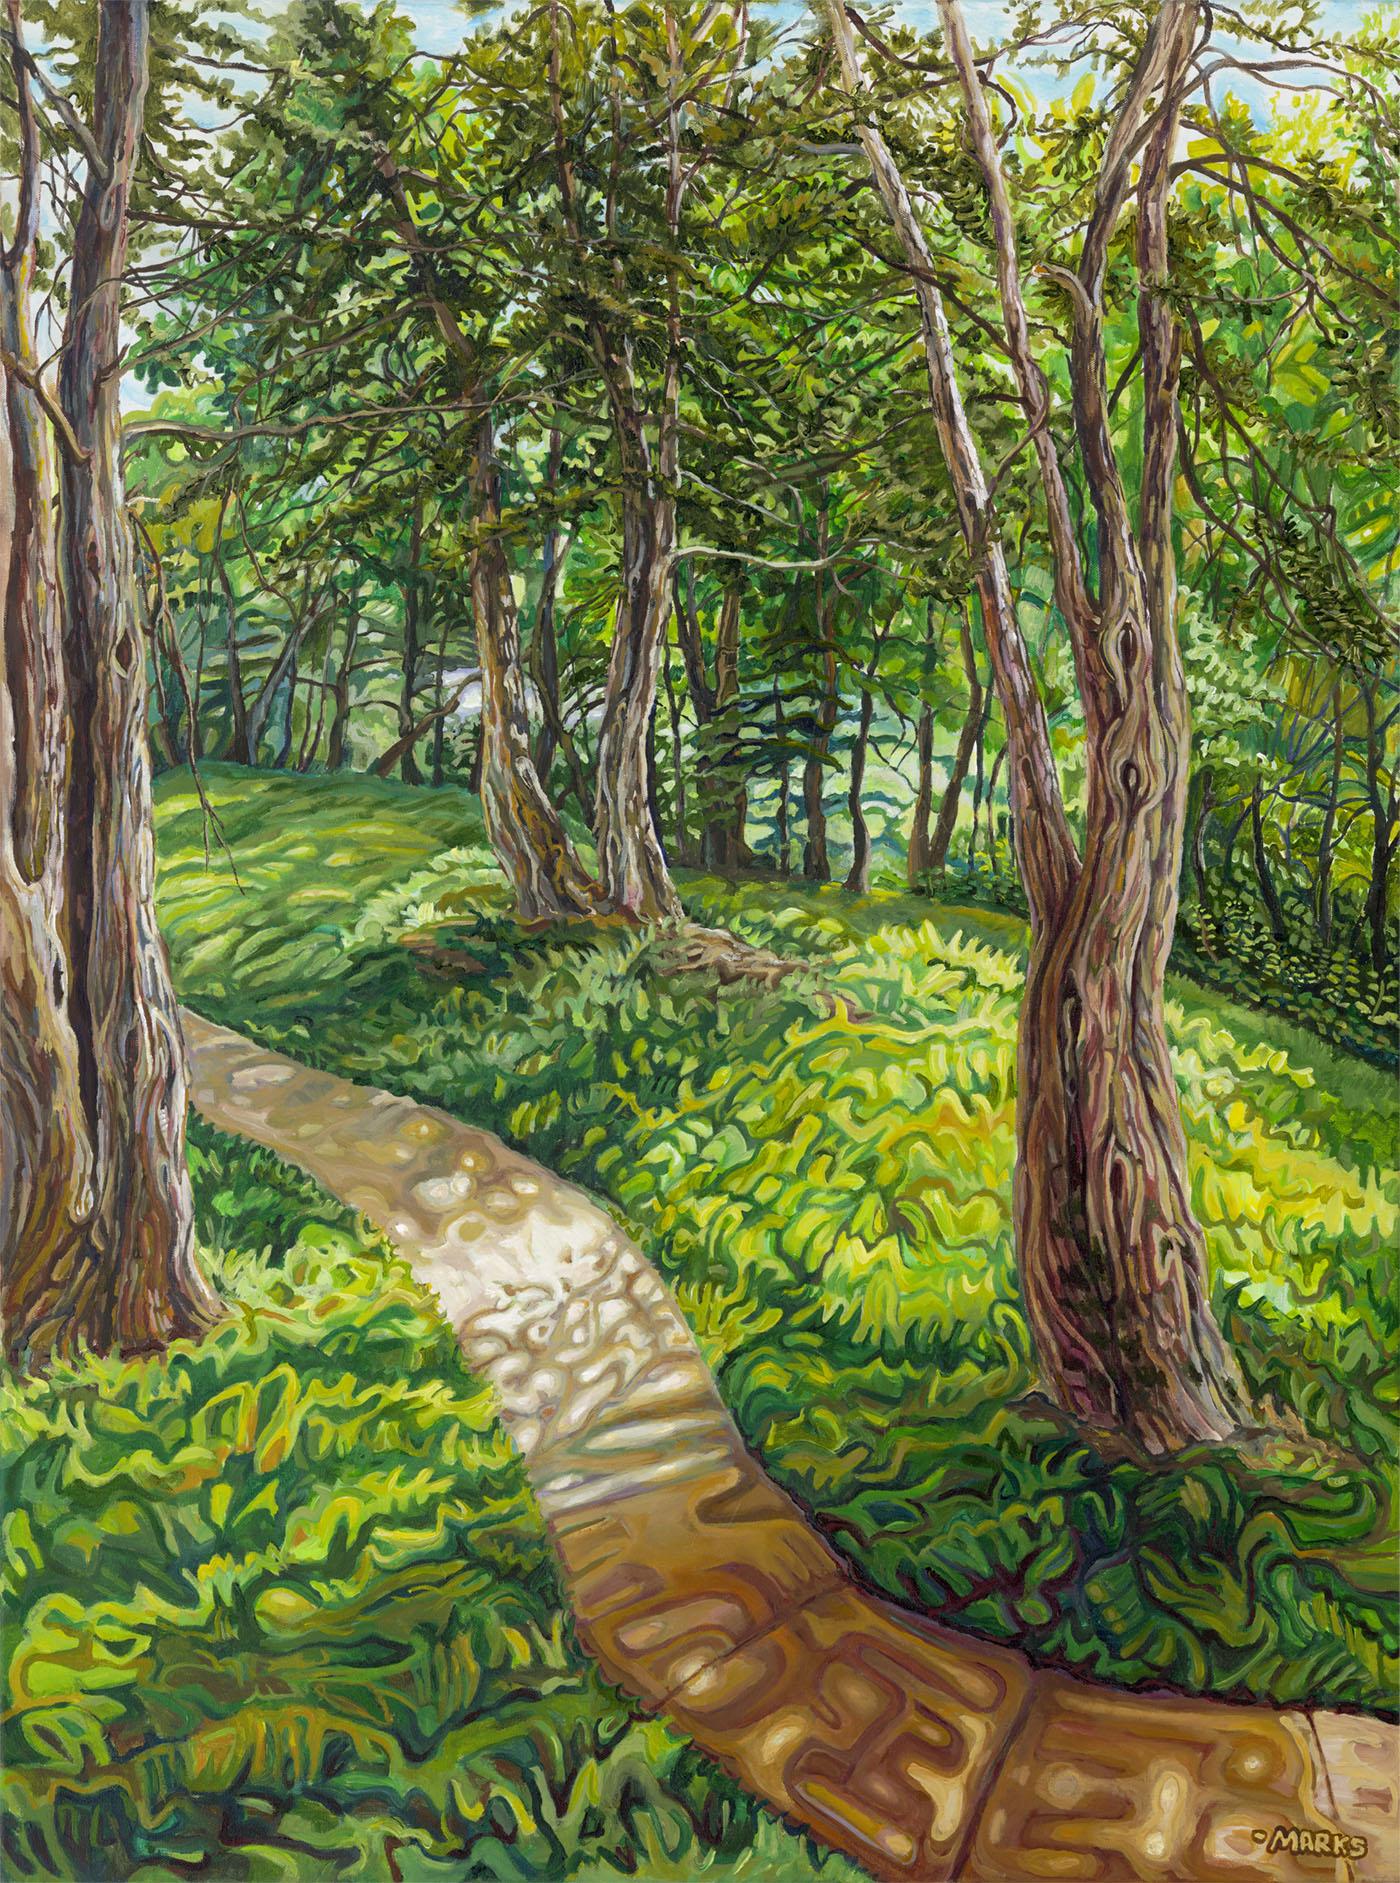 Backbone Cedars - 30 x 40 - Acrylic on Canvas - $3,000